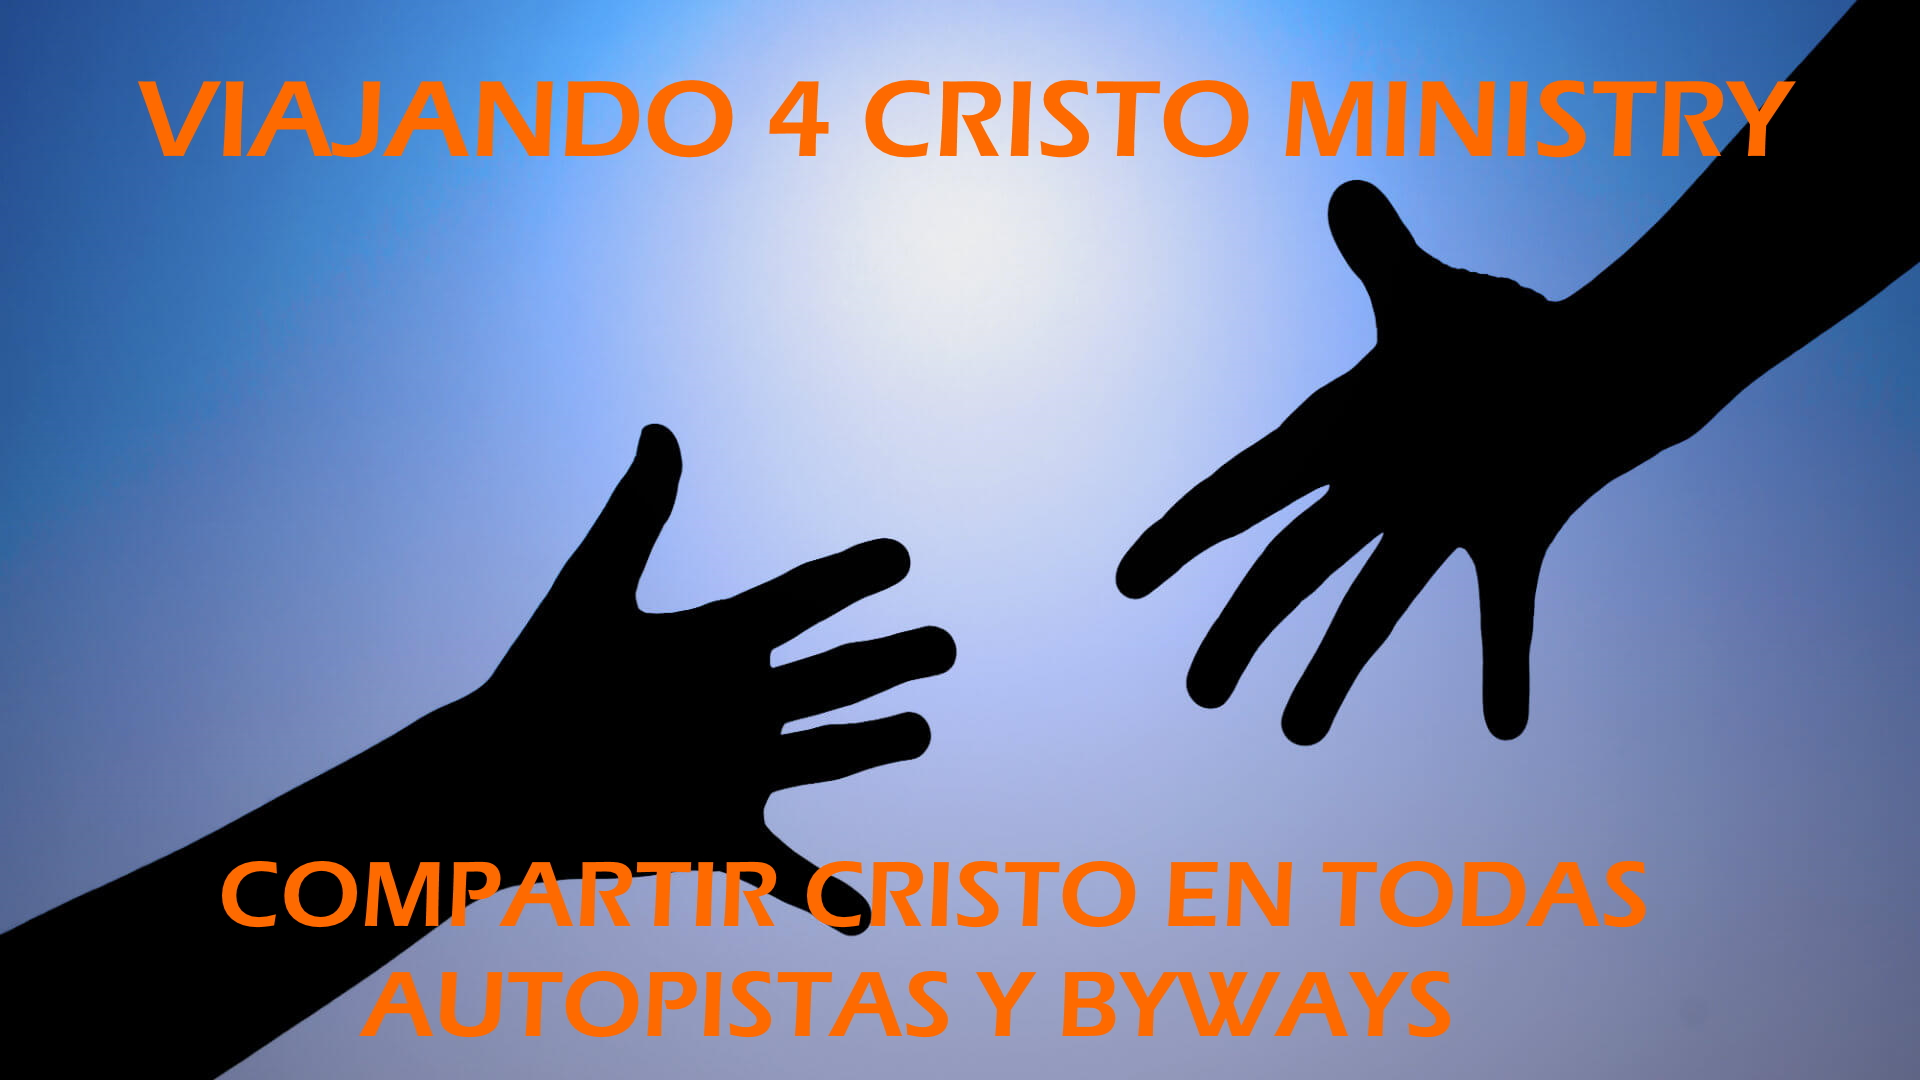 VIAJANDO 4CRISTO MINISTRY